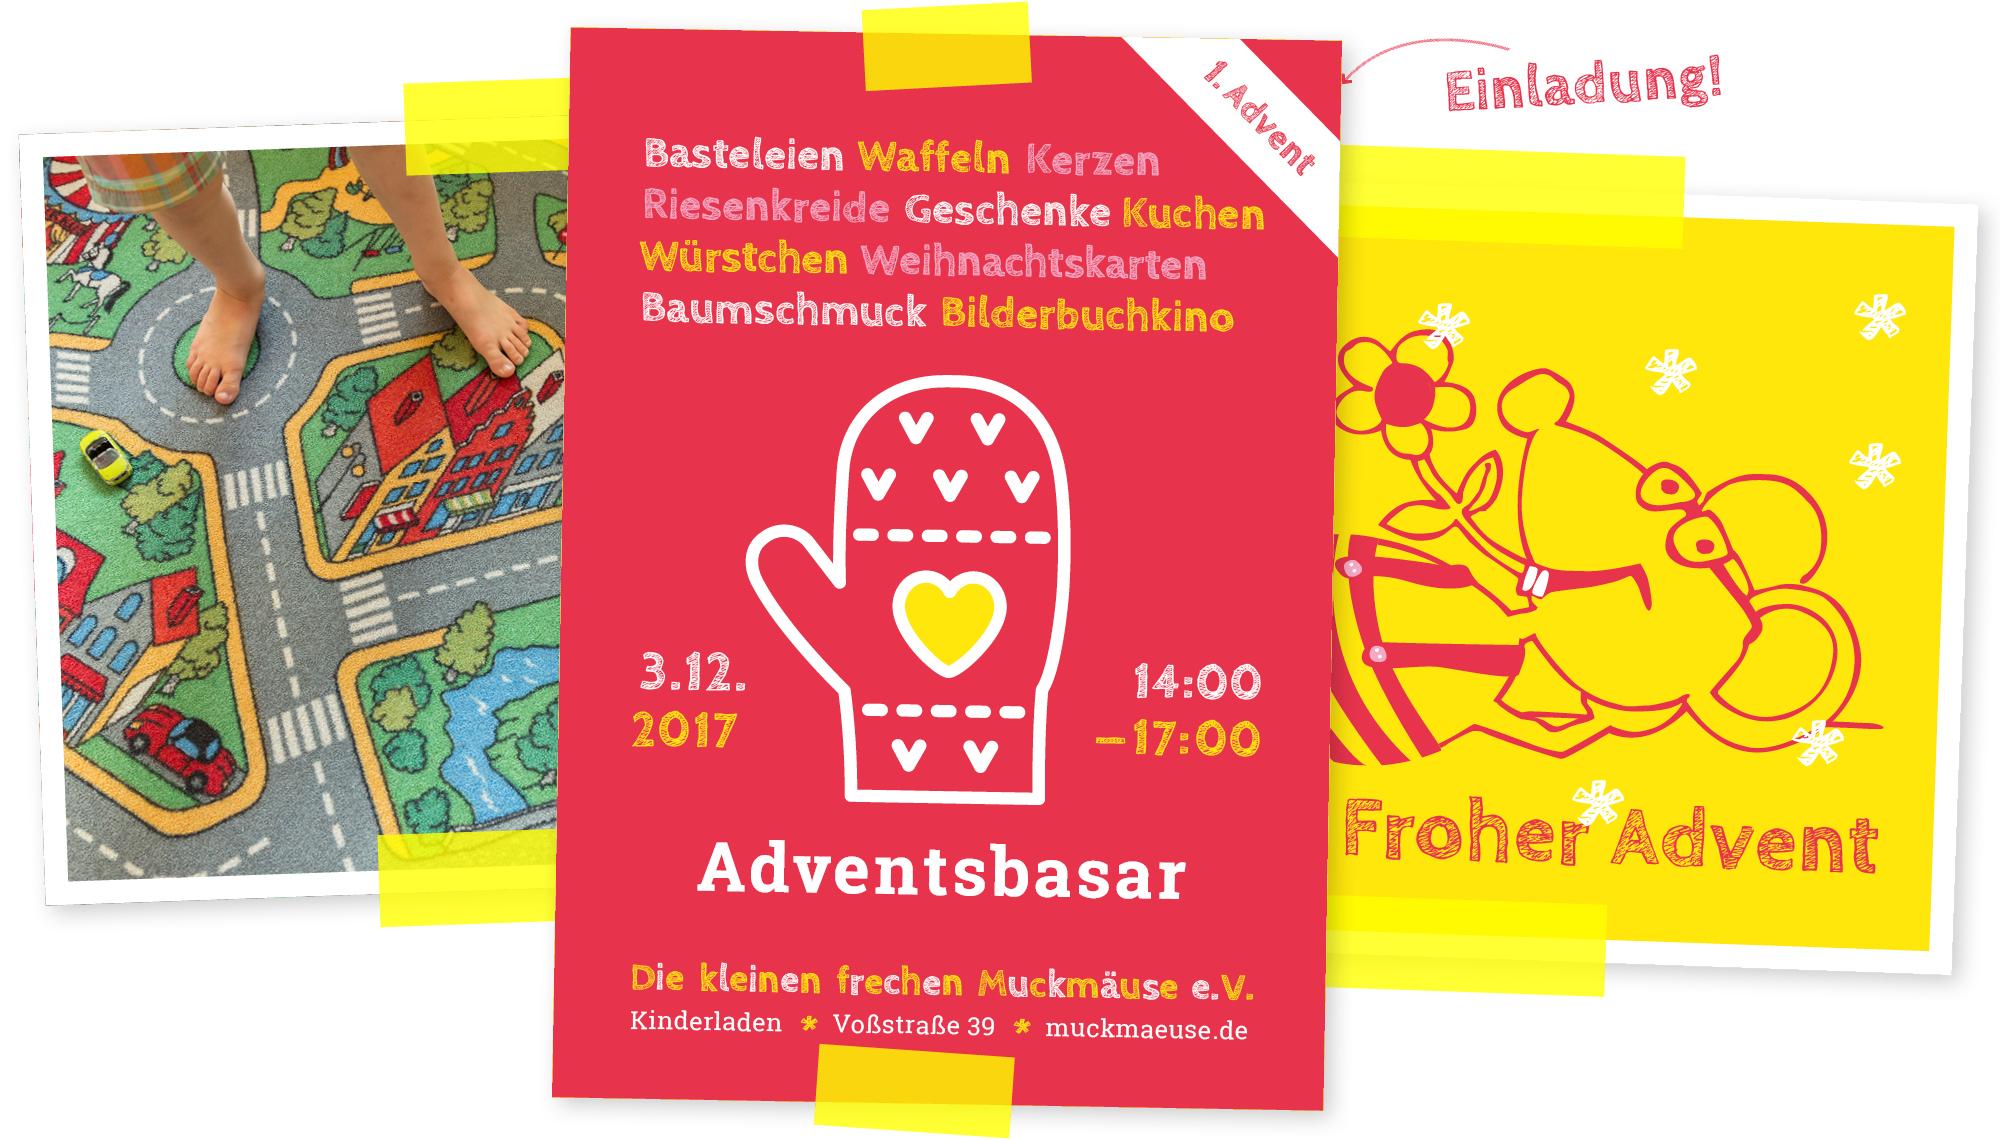 Adventsbasar 2017 Einladung